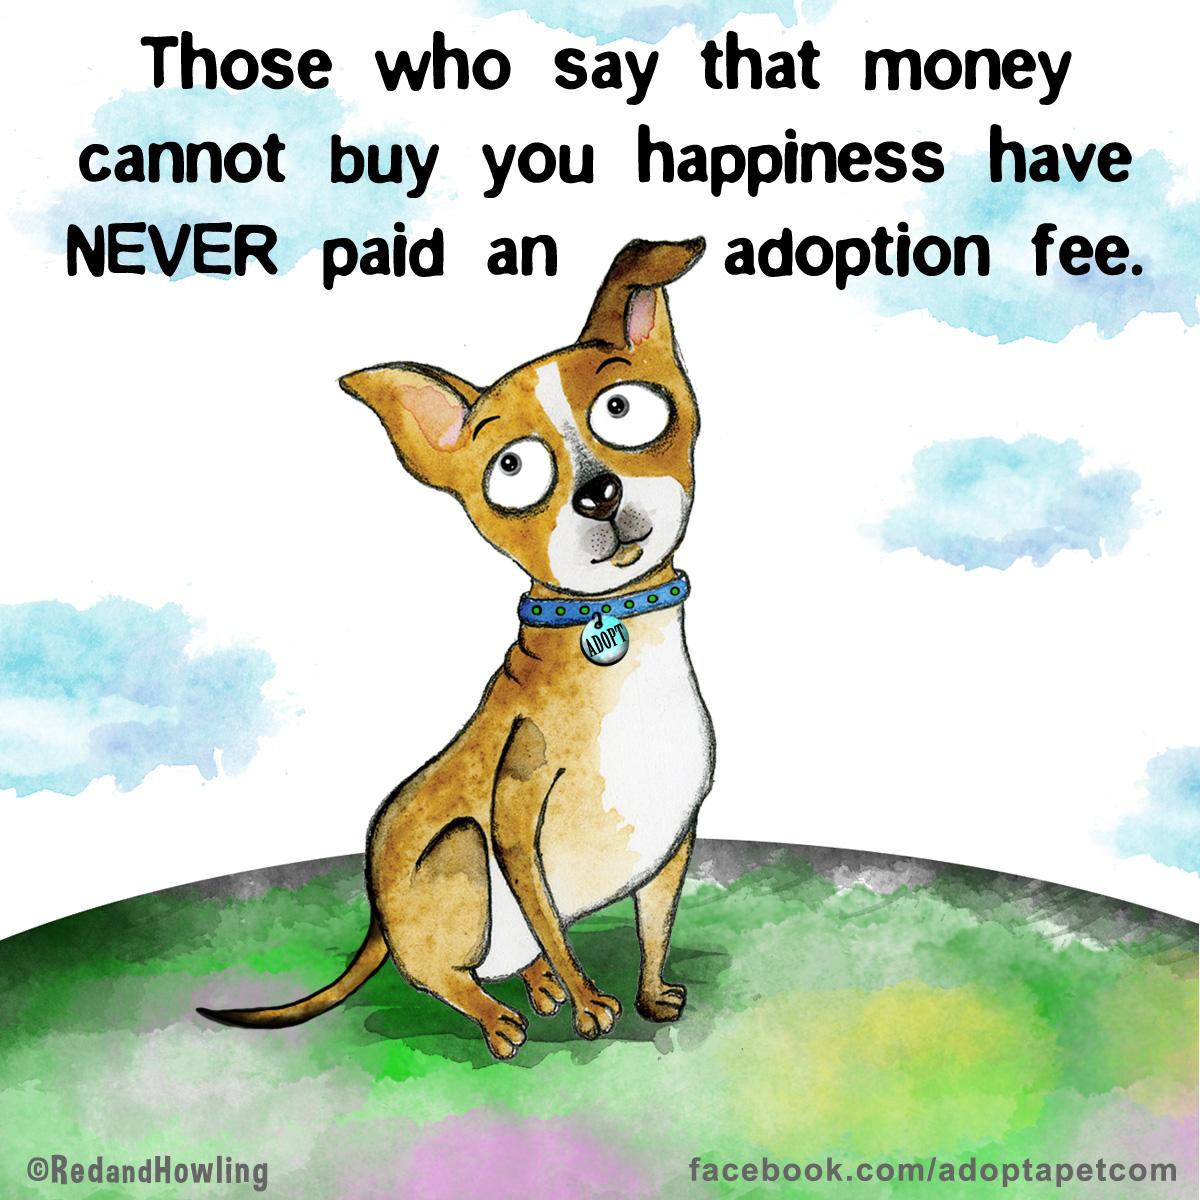 AdoptionAAP